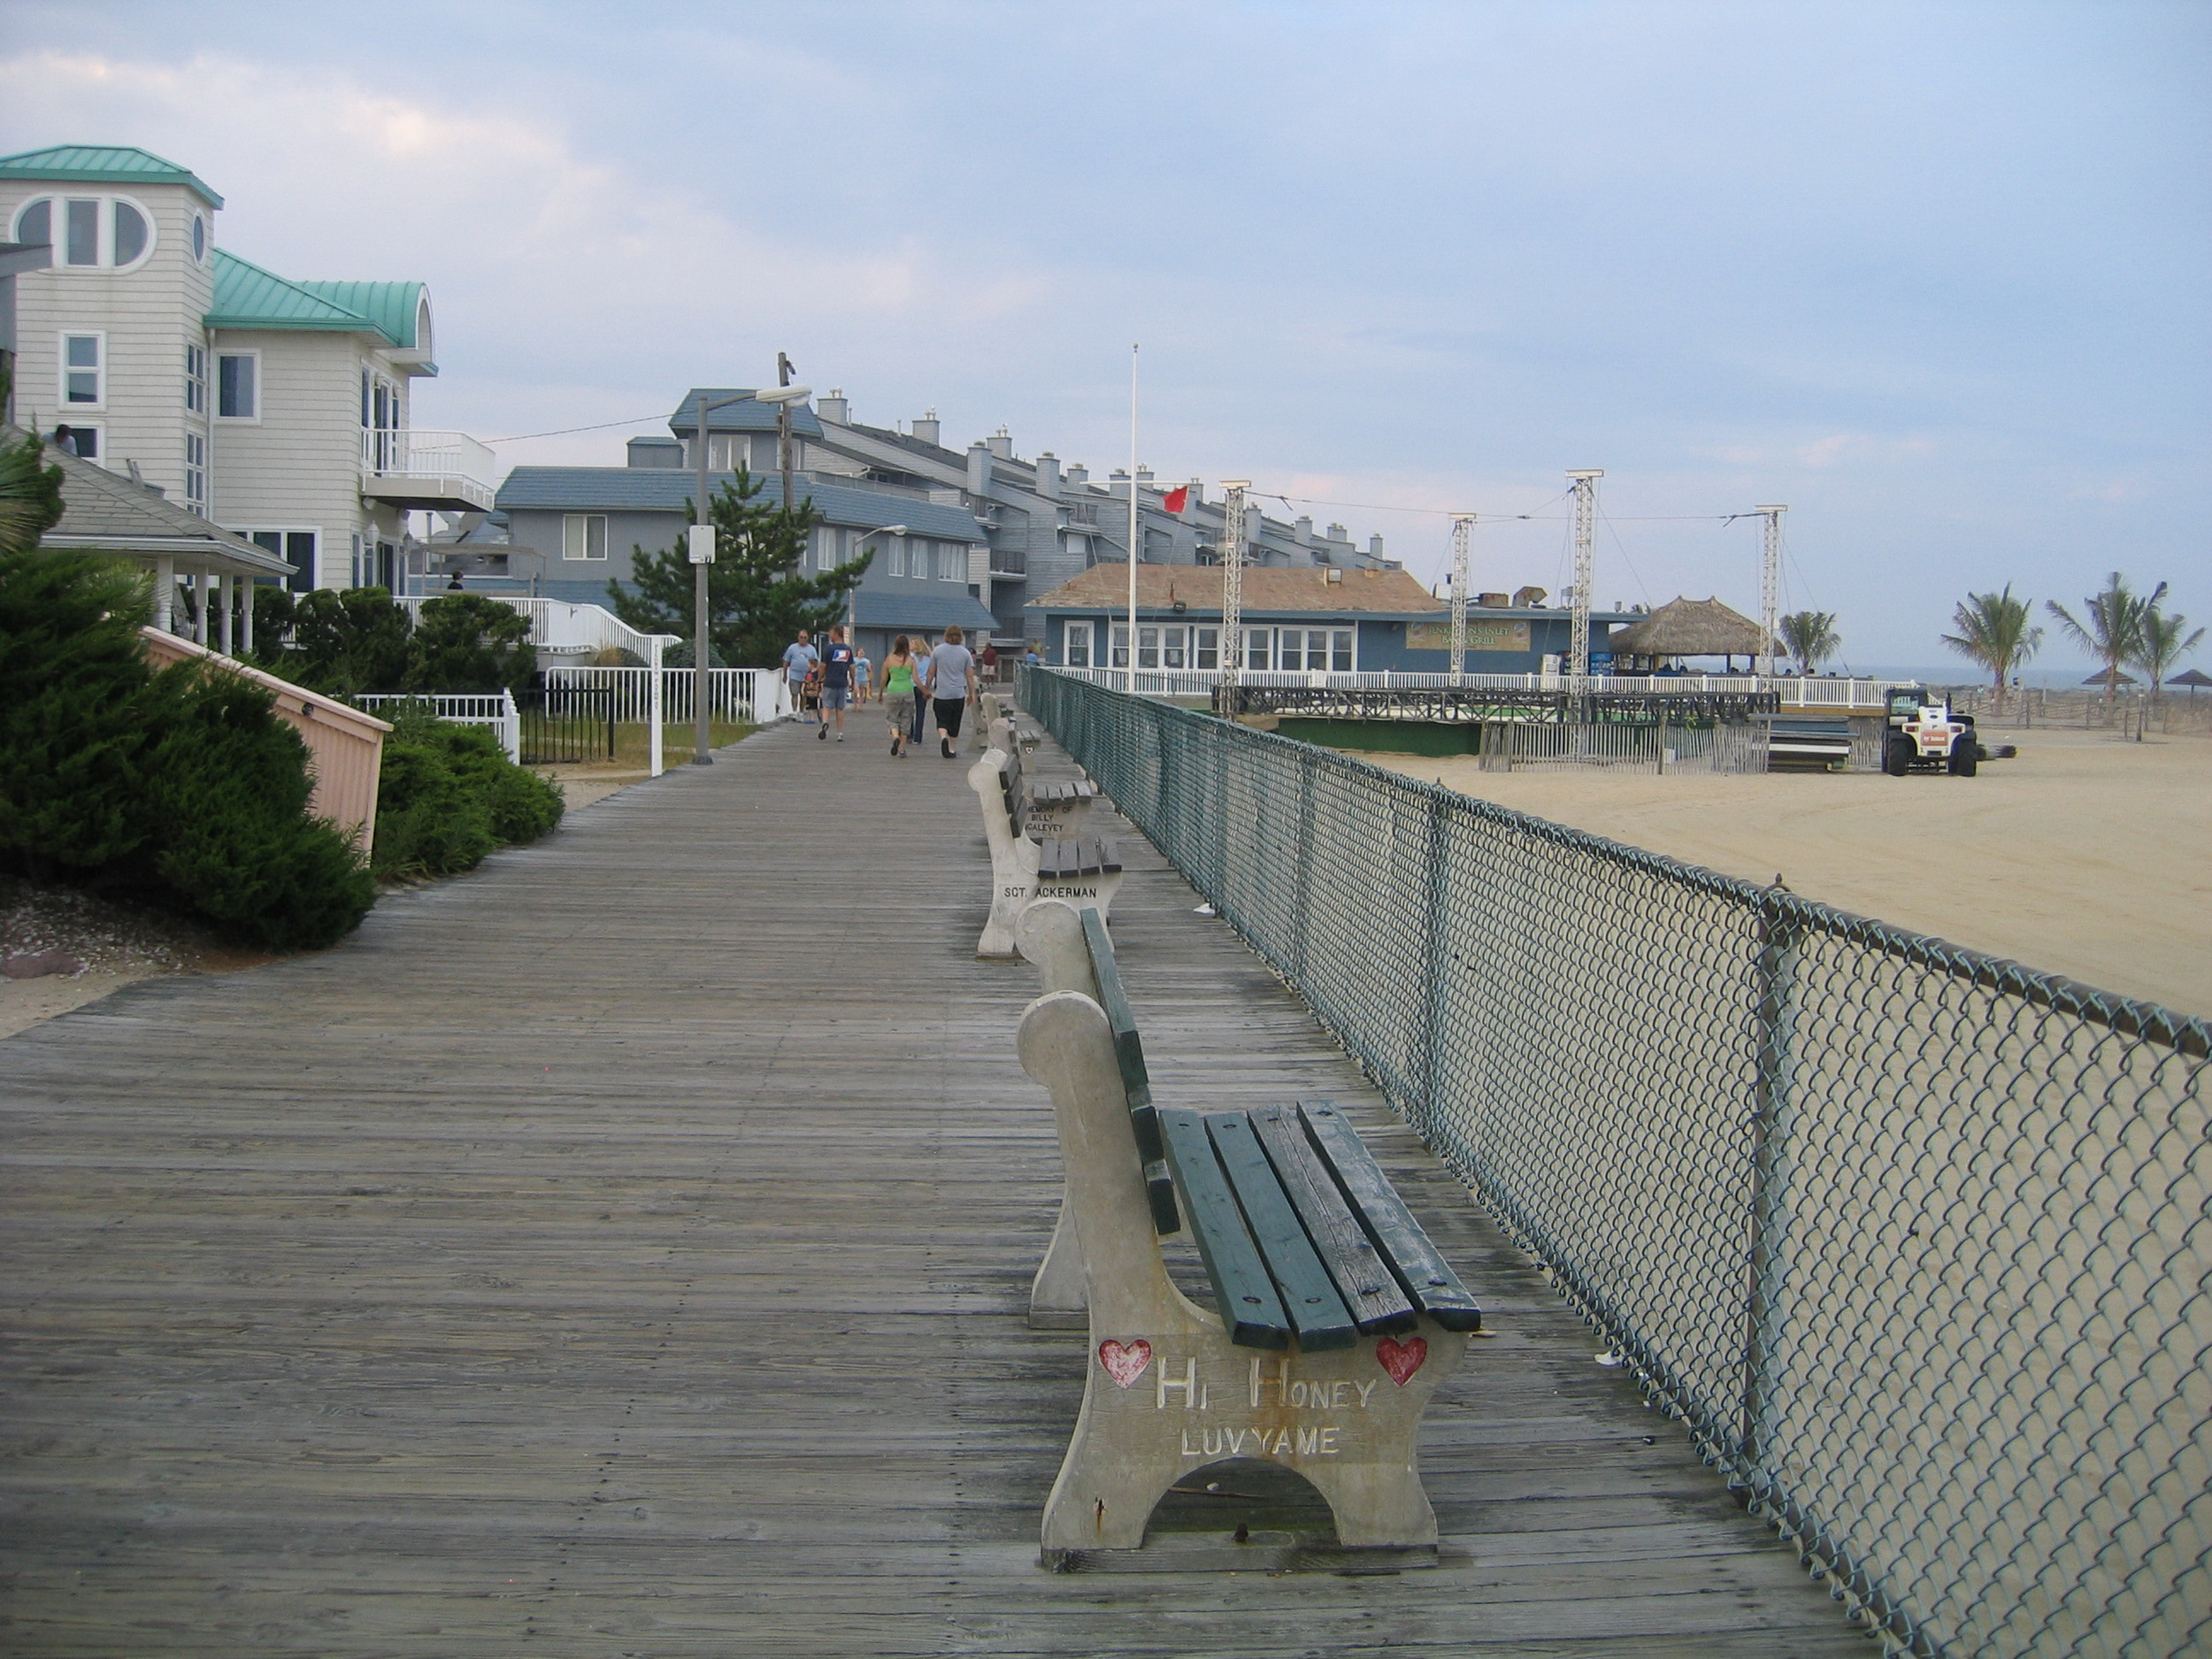 PPB boardwalk north view.jpg